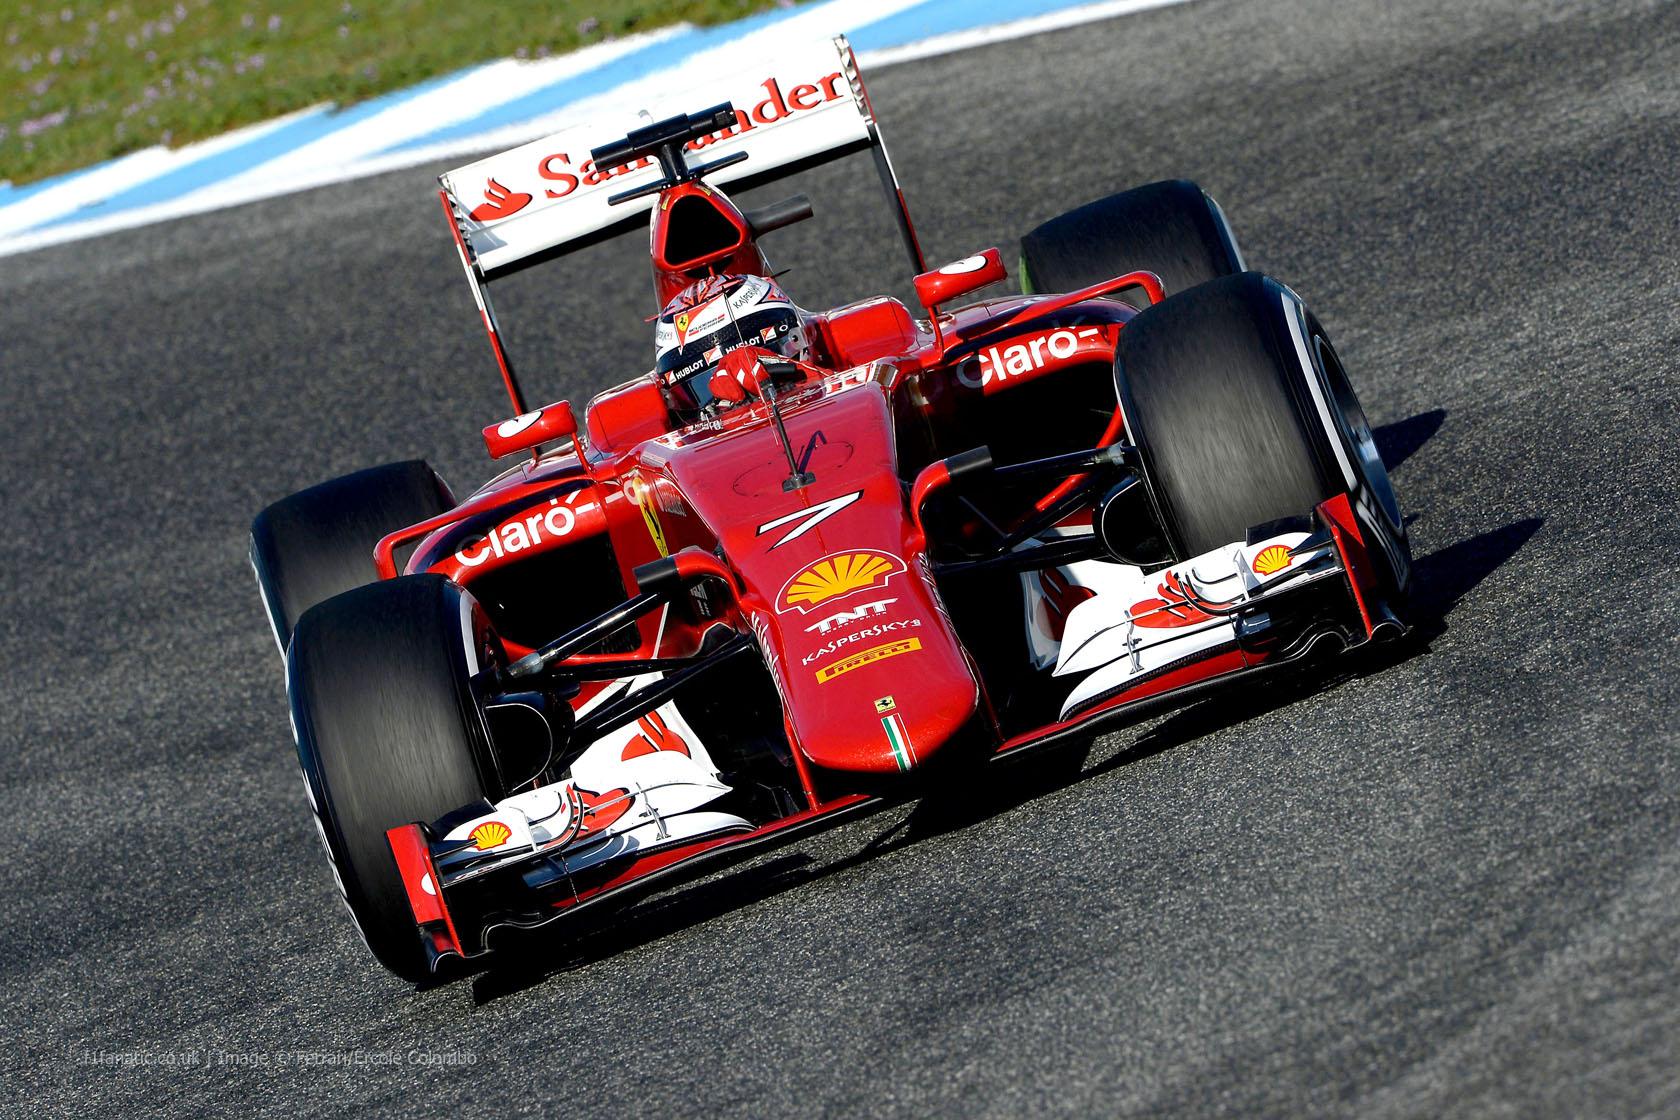 Kimi Raikkonen, Ferrari, Circuito de Jerez, 2015